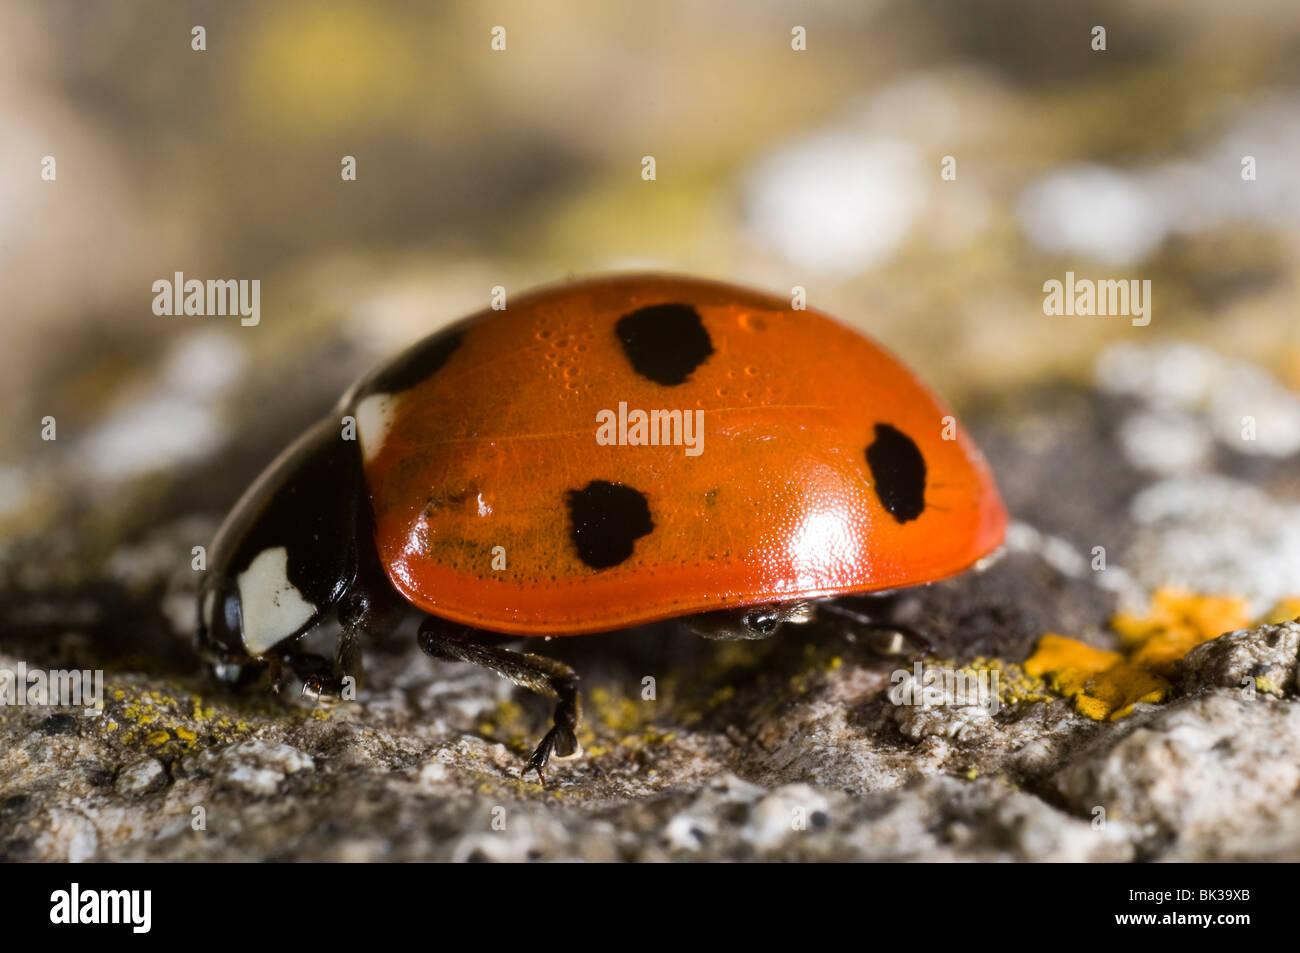 Seven-spot Ladybird (Coccinella septempunctata) on a stone - Stock Image